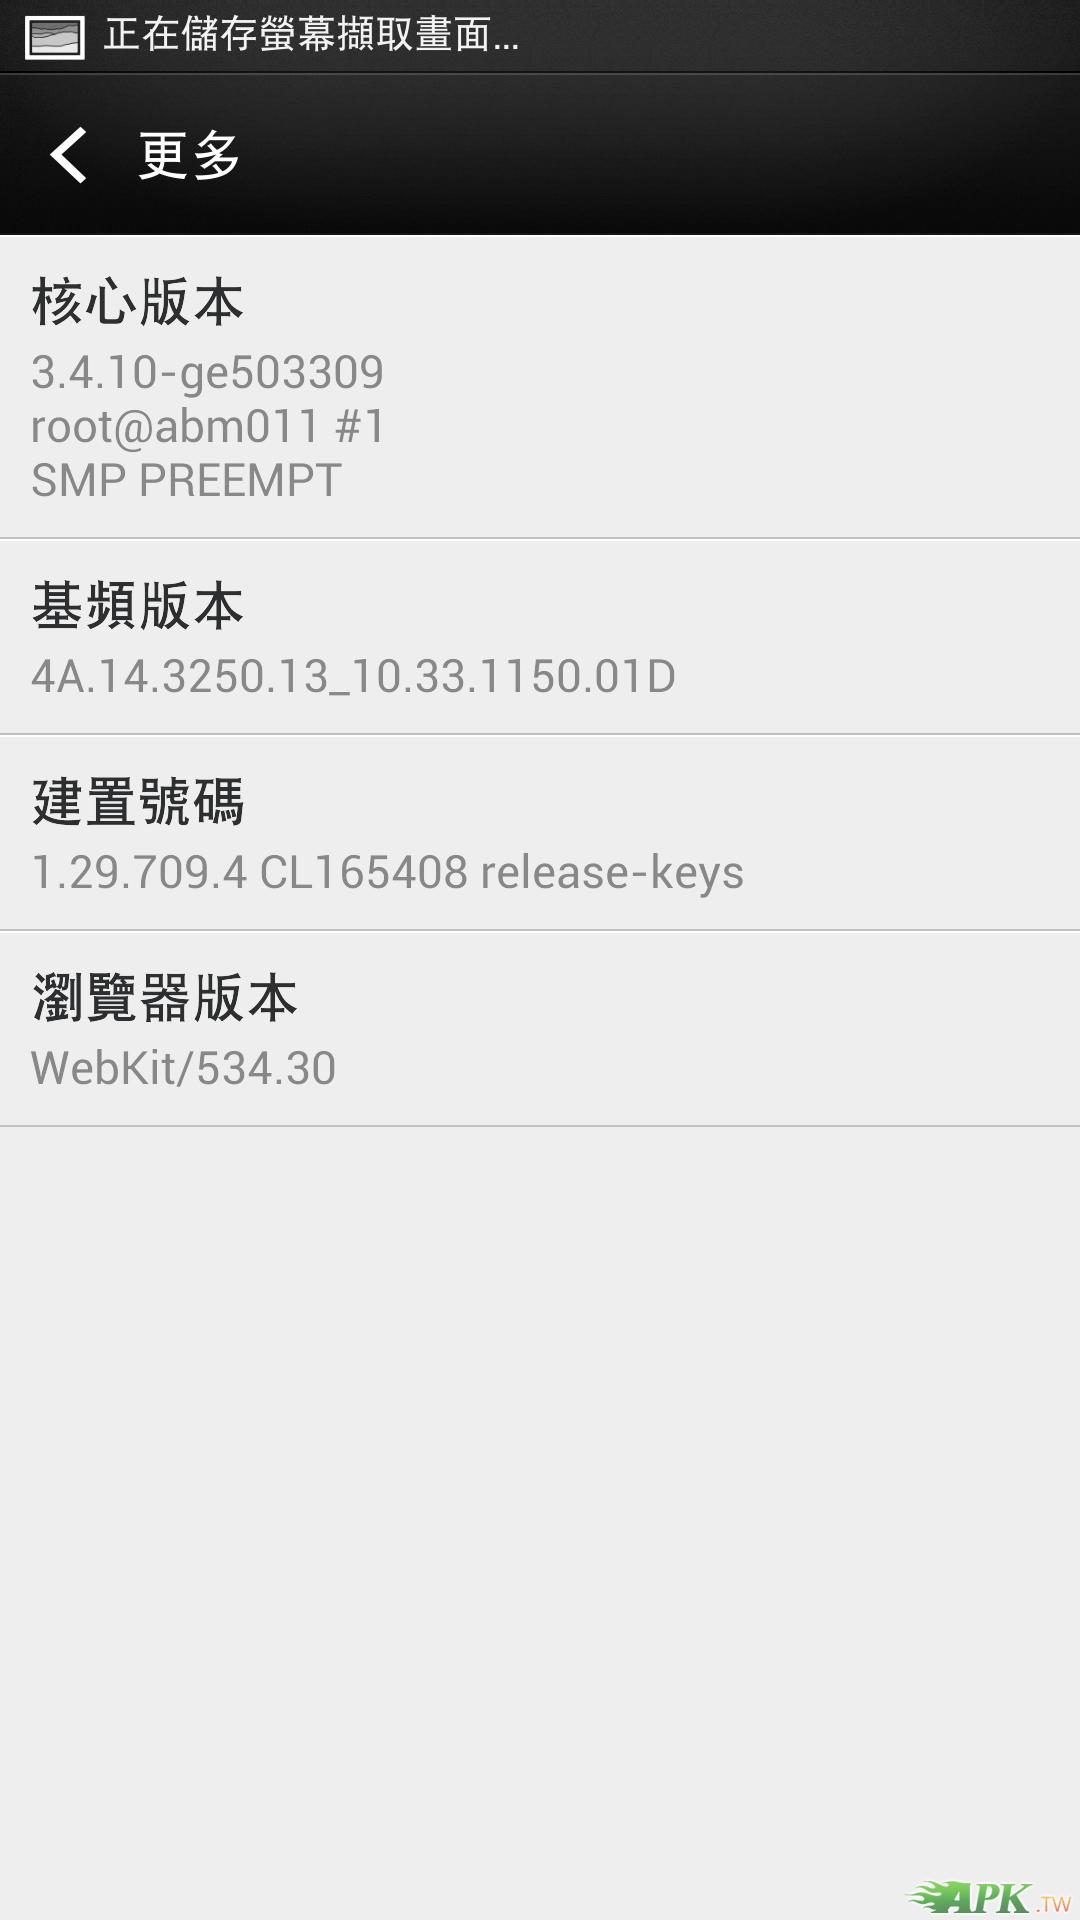 Screenshot_2013-03-31-00-41-31.png